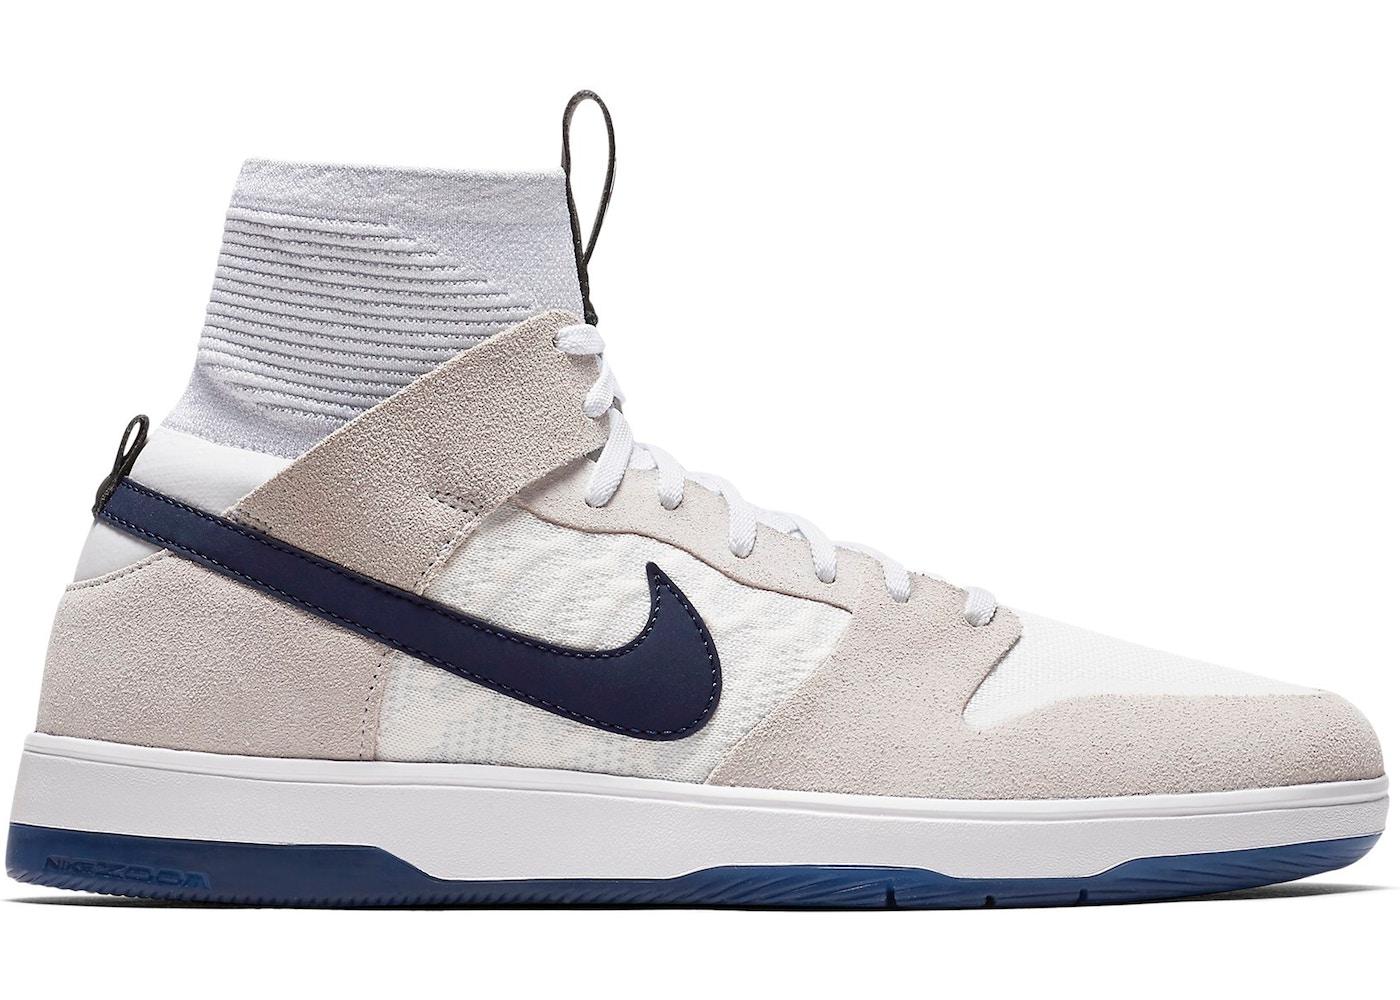 843f546d166 Nike SB Dunk High Elite Cyrus Bennett - 918287-141